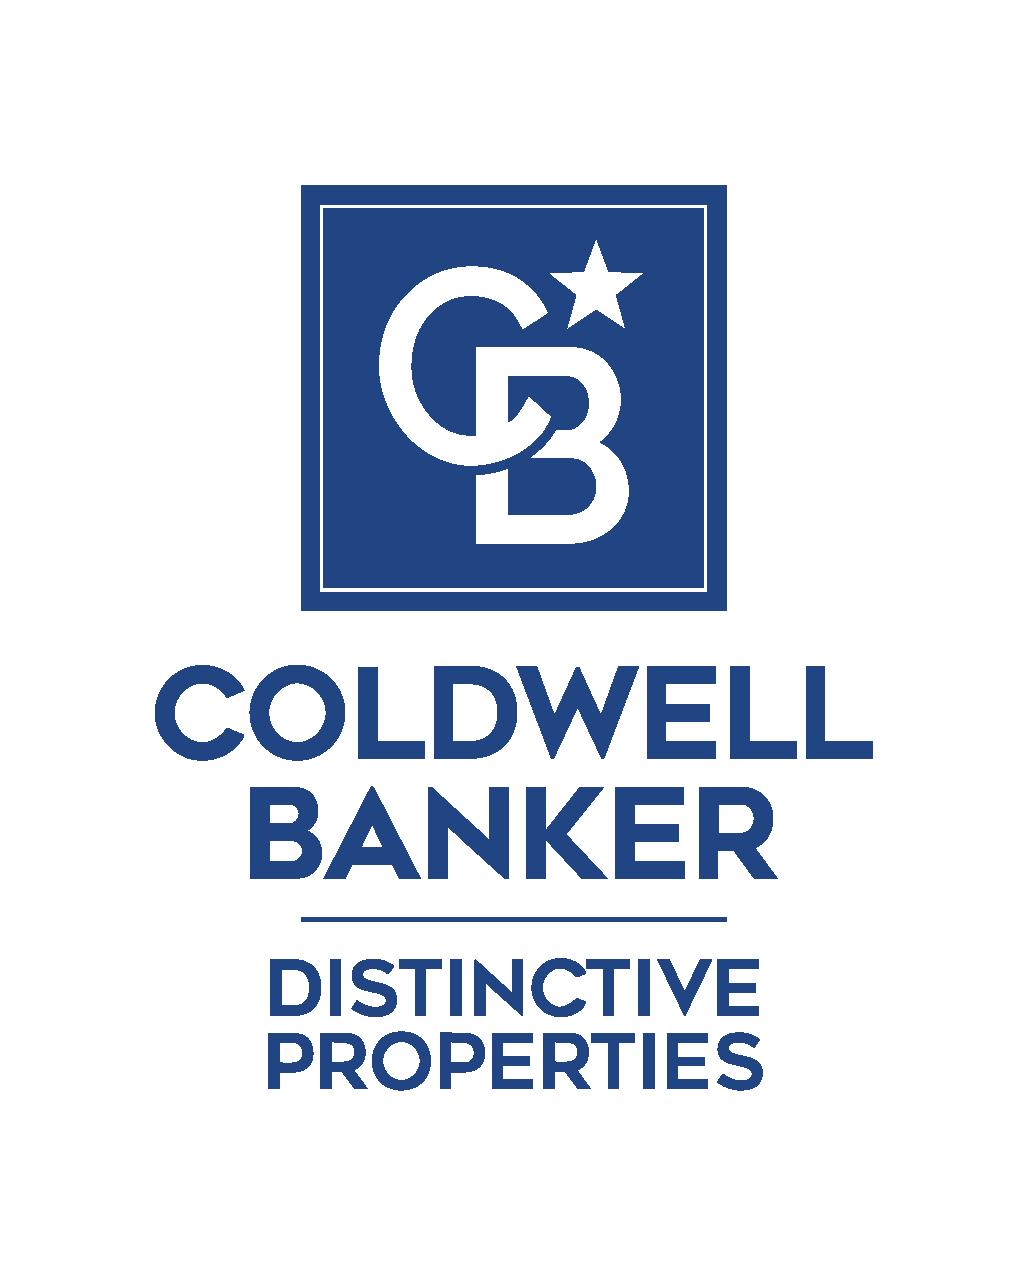 Sharon Stachlowski - Coldwell Banker Distinctive Properties Logo